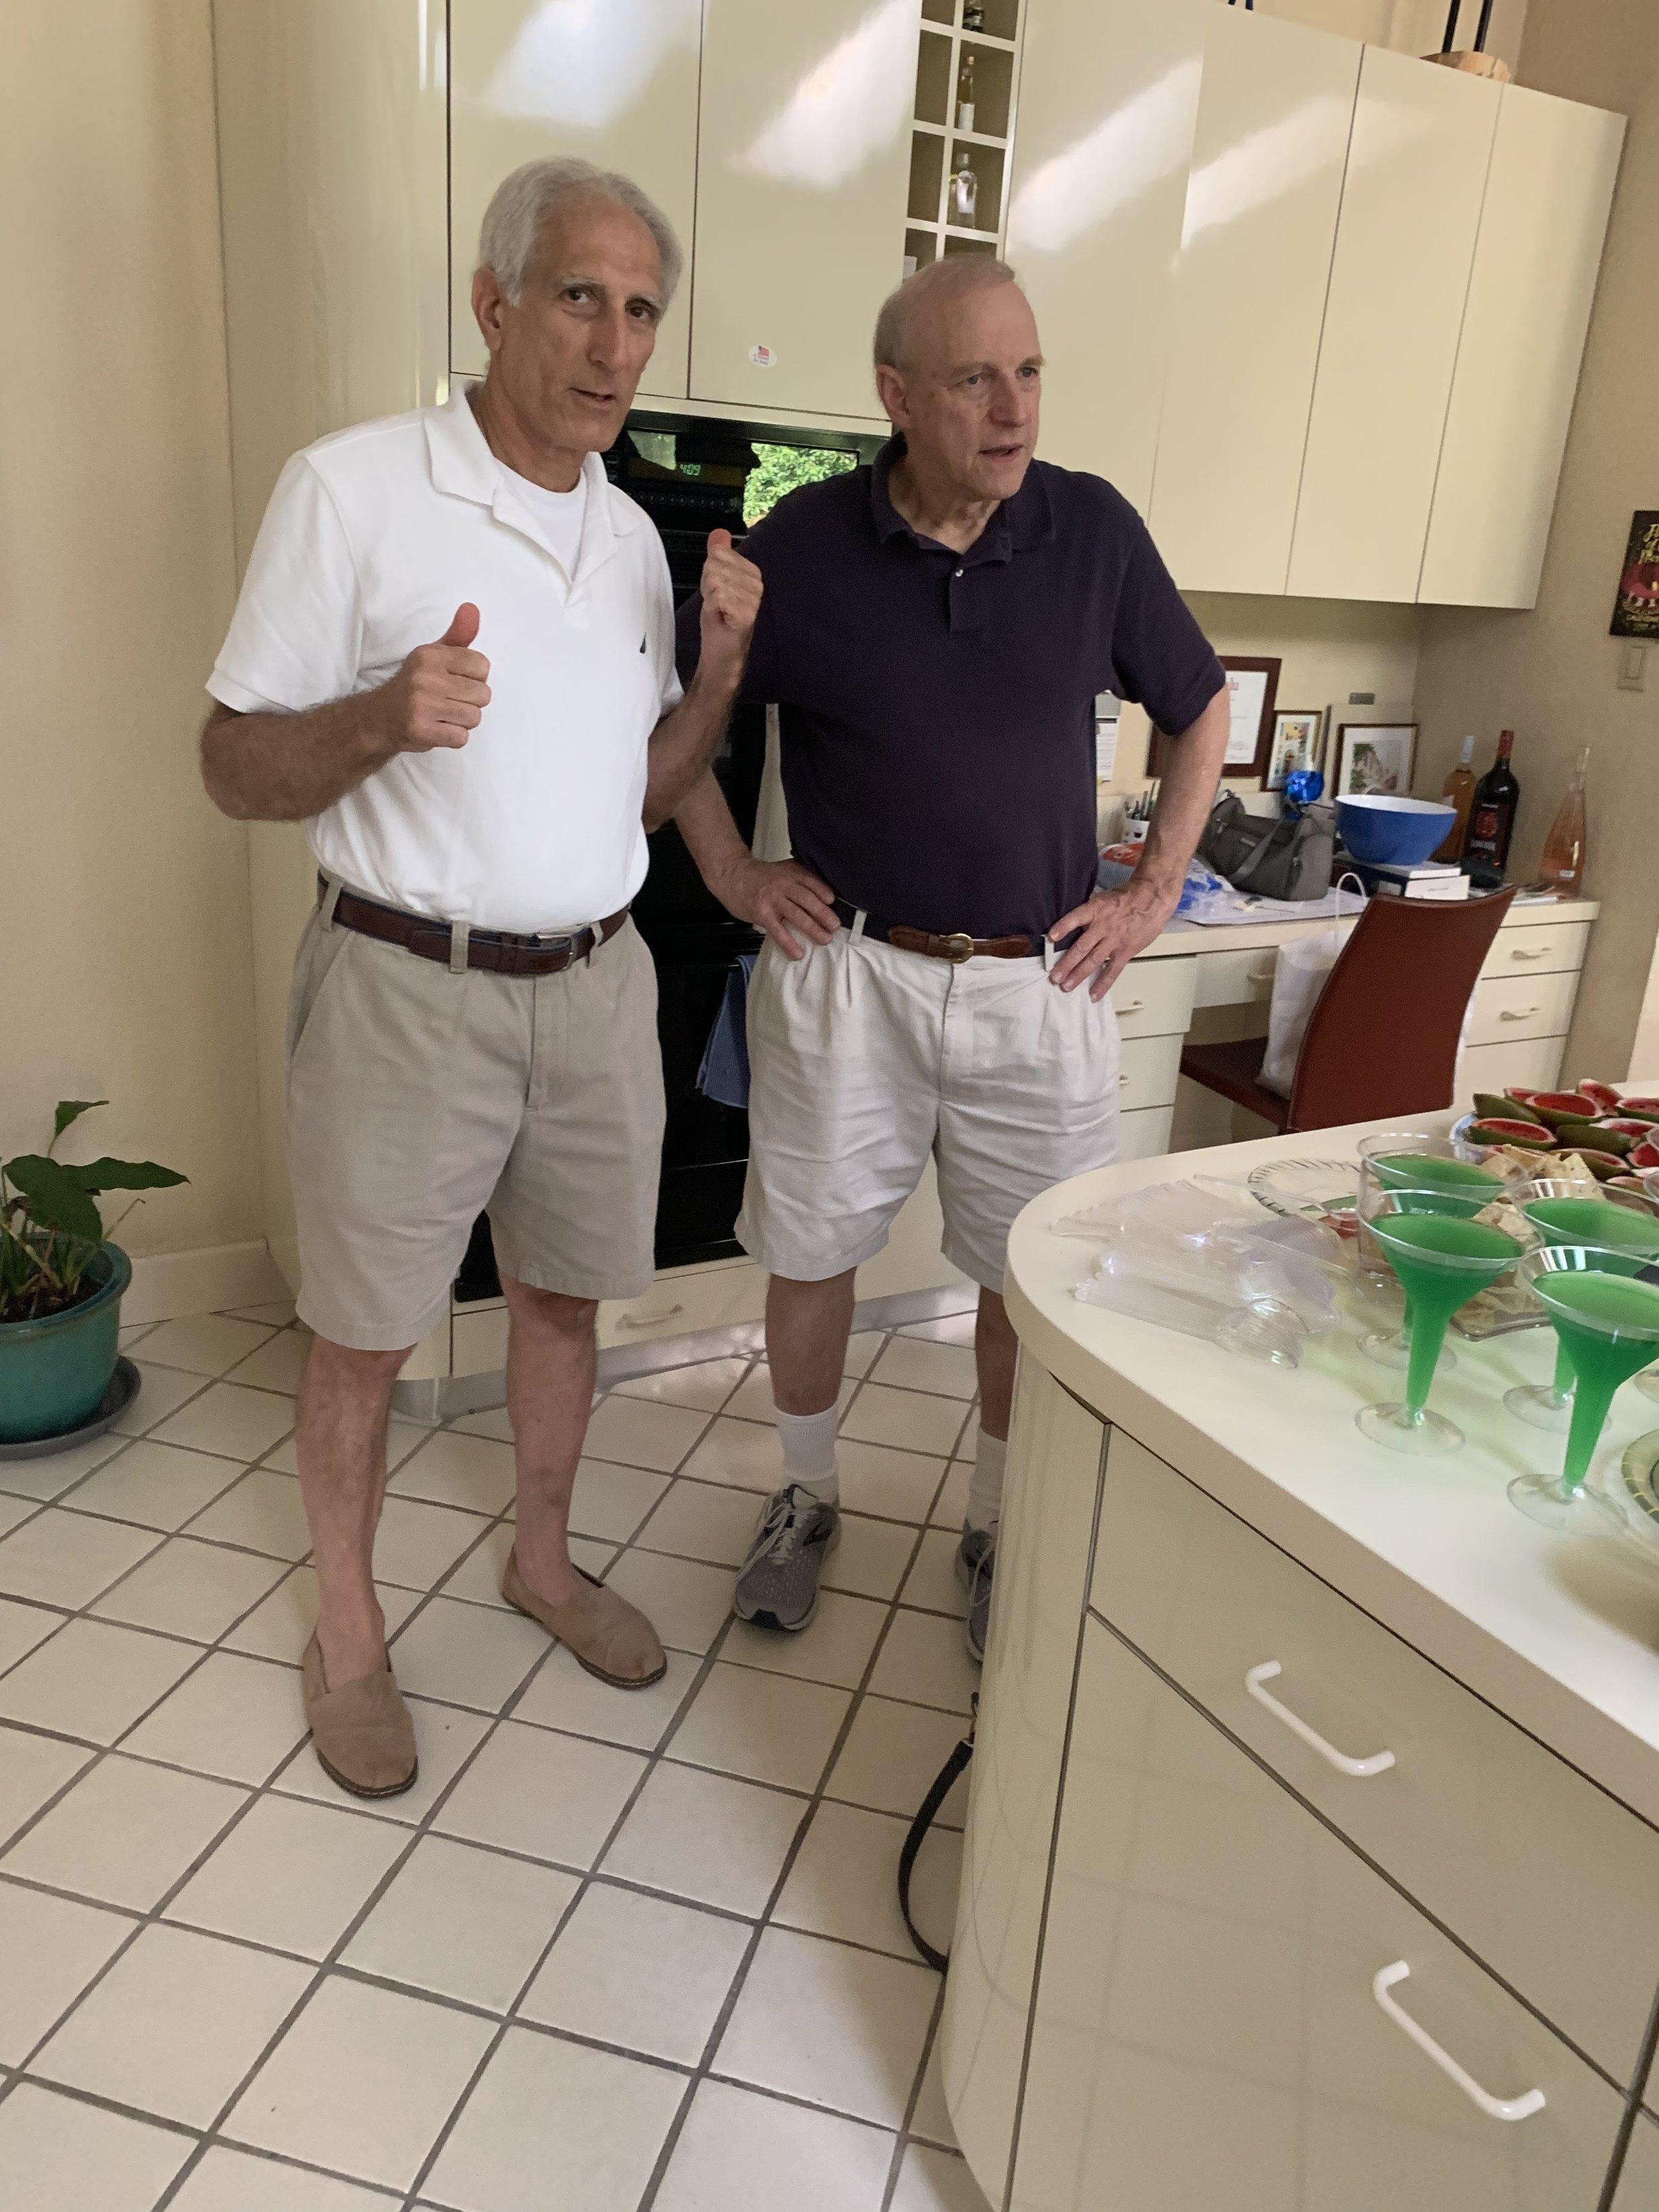 Bernie Salamon and Mark Iwry